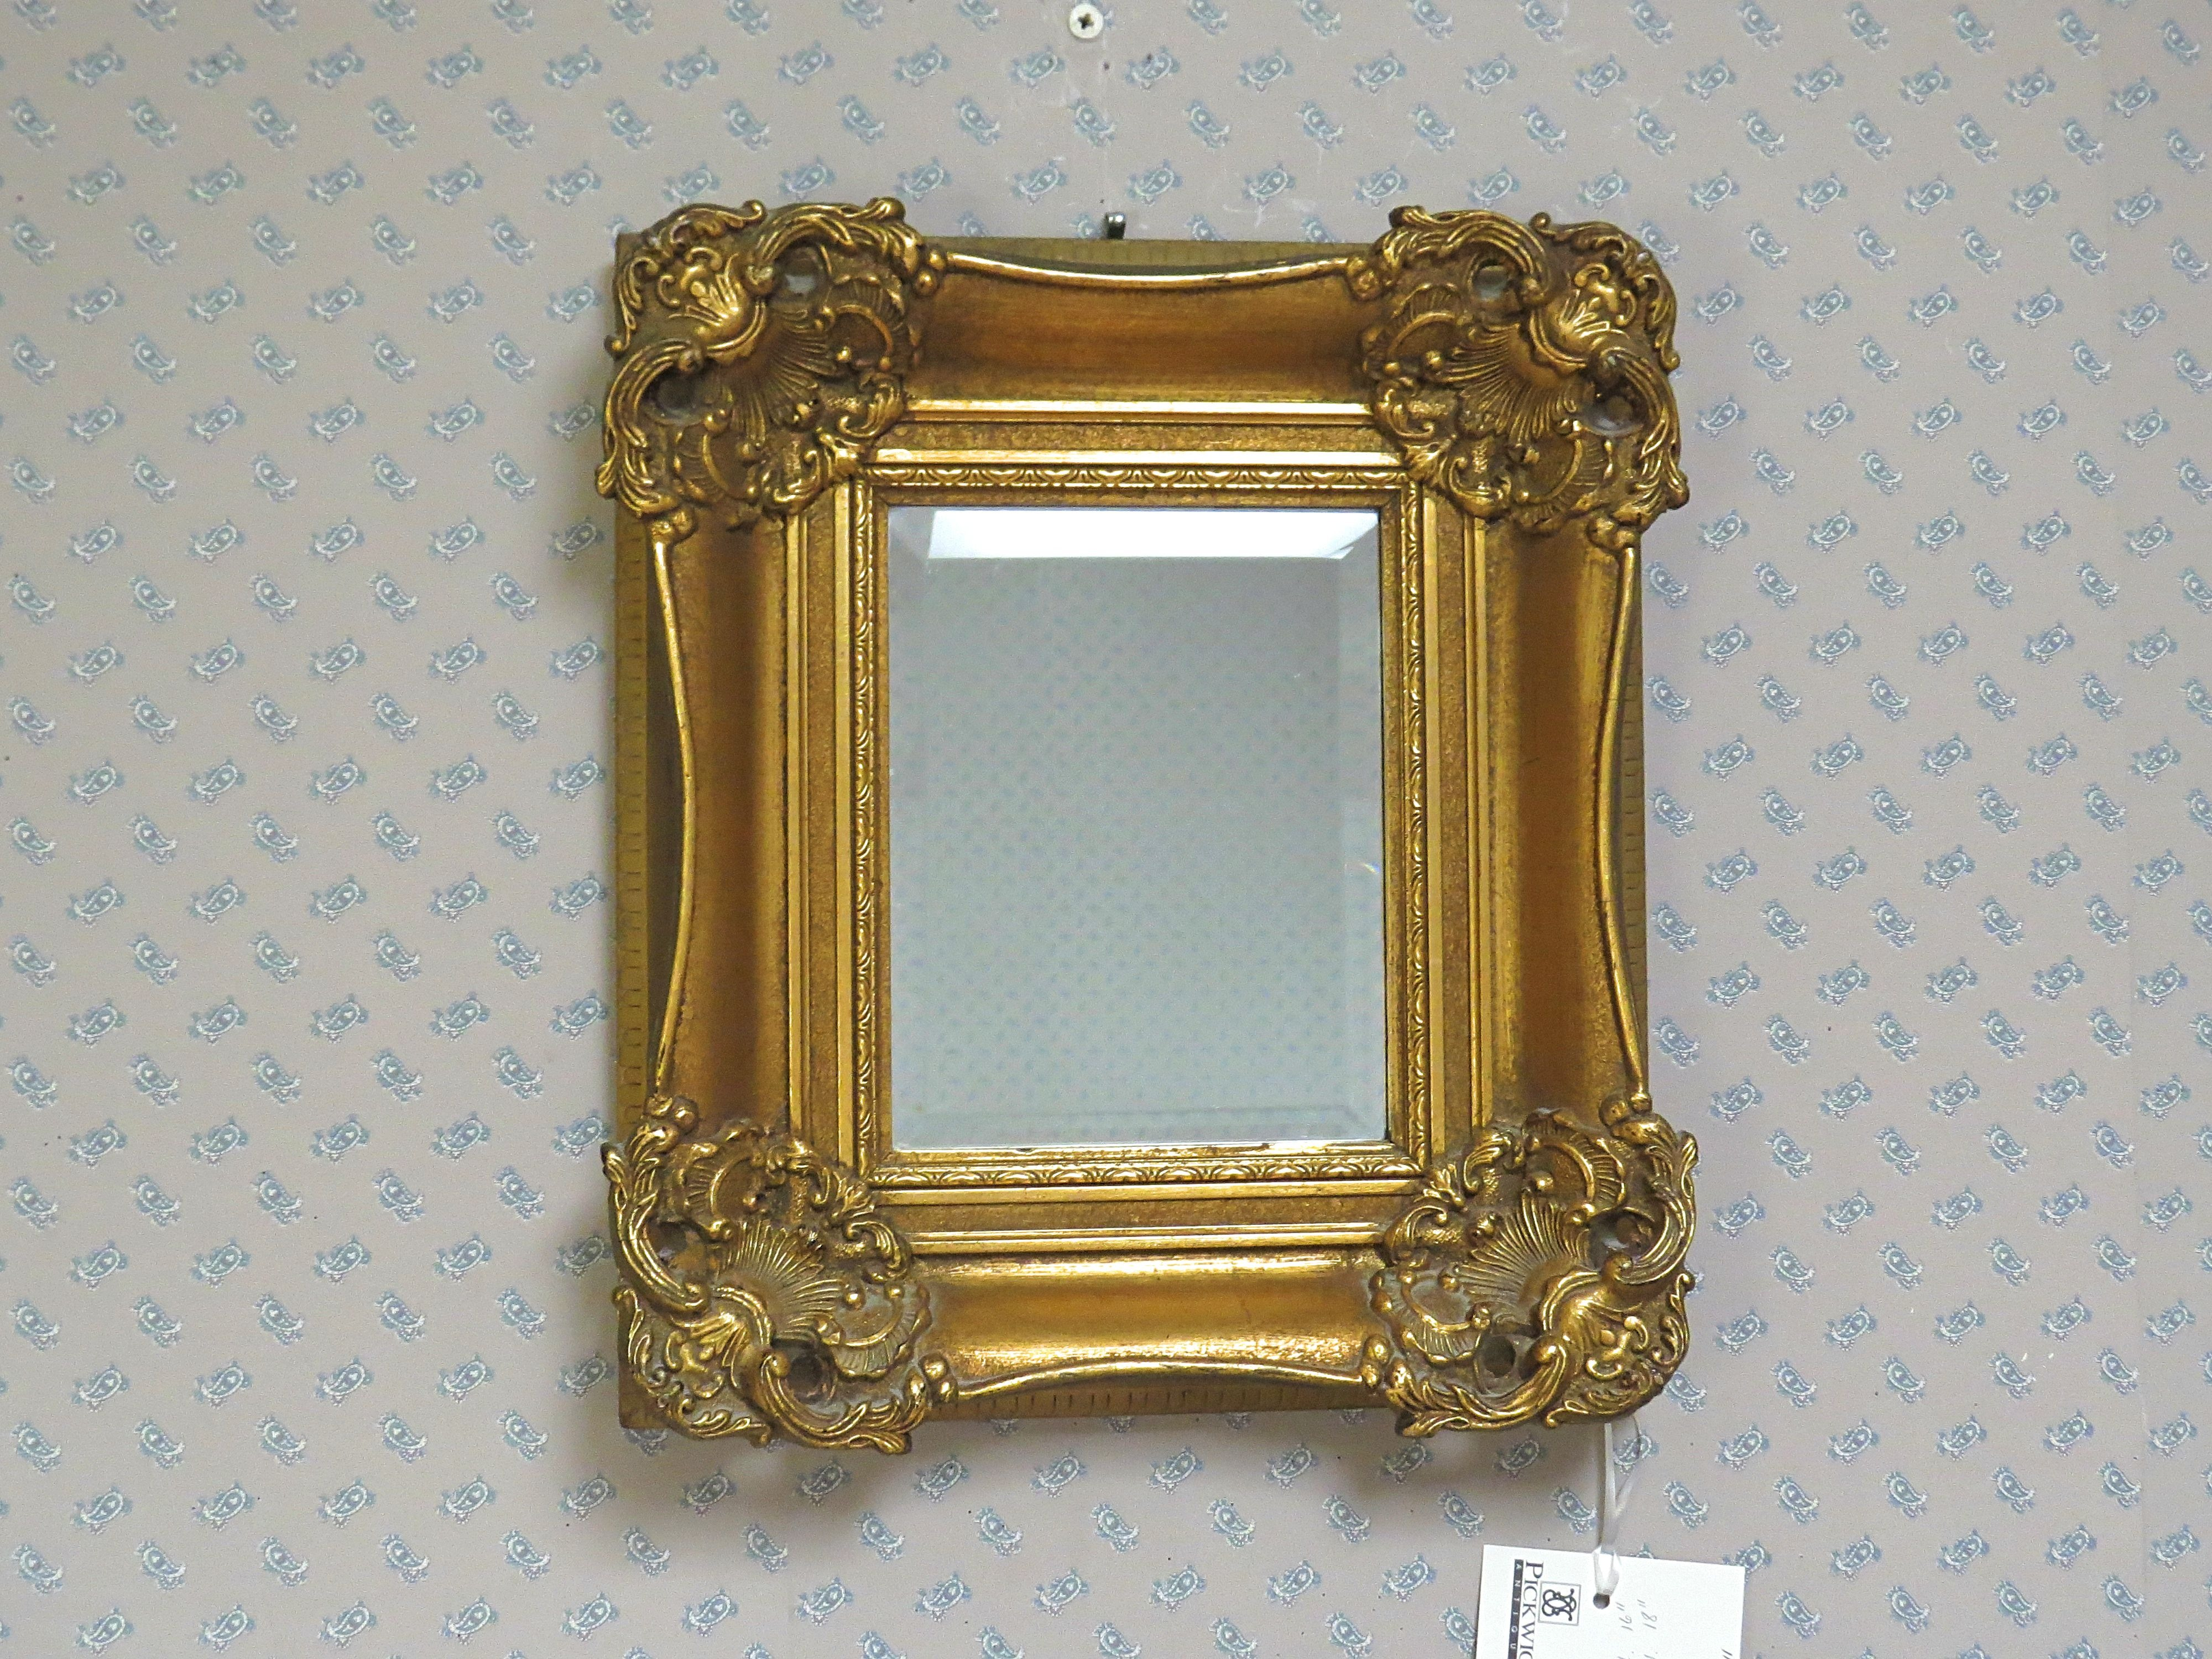 Gold Framed Decorative Mirror